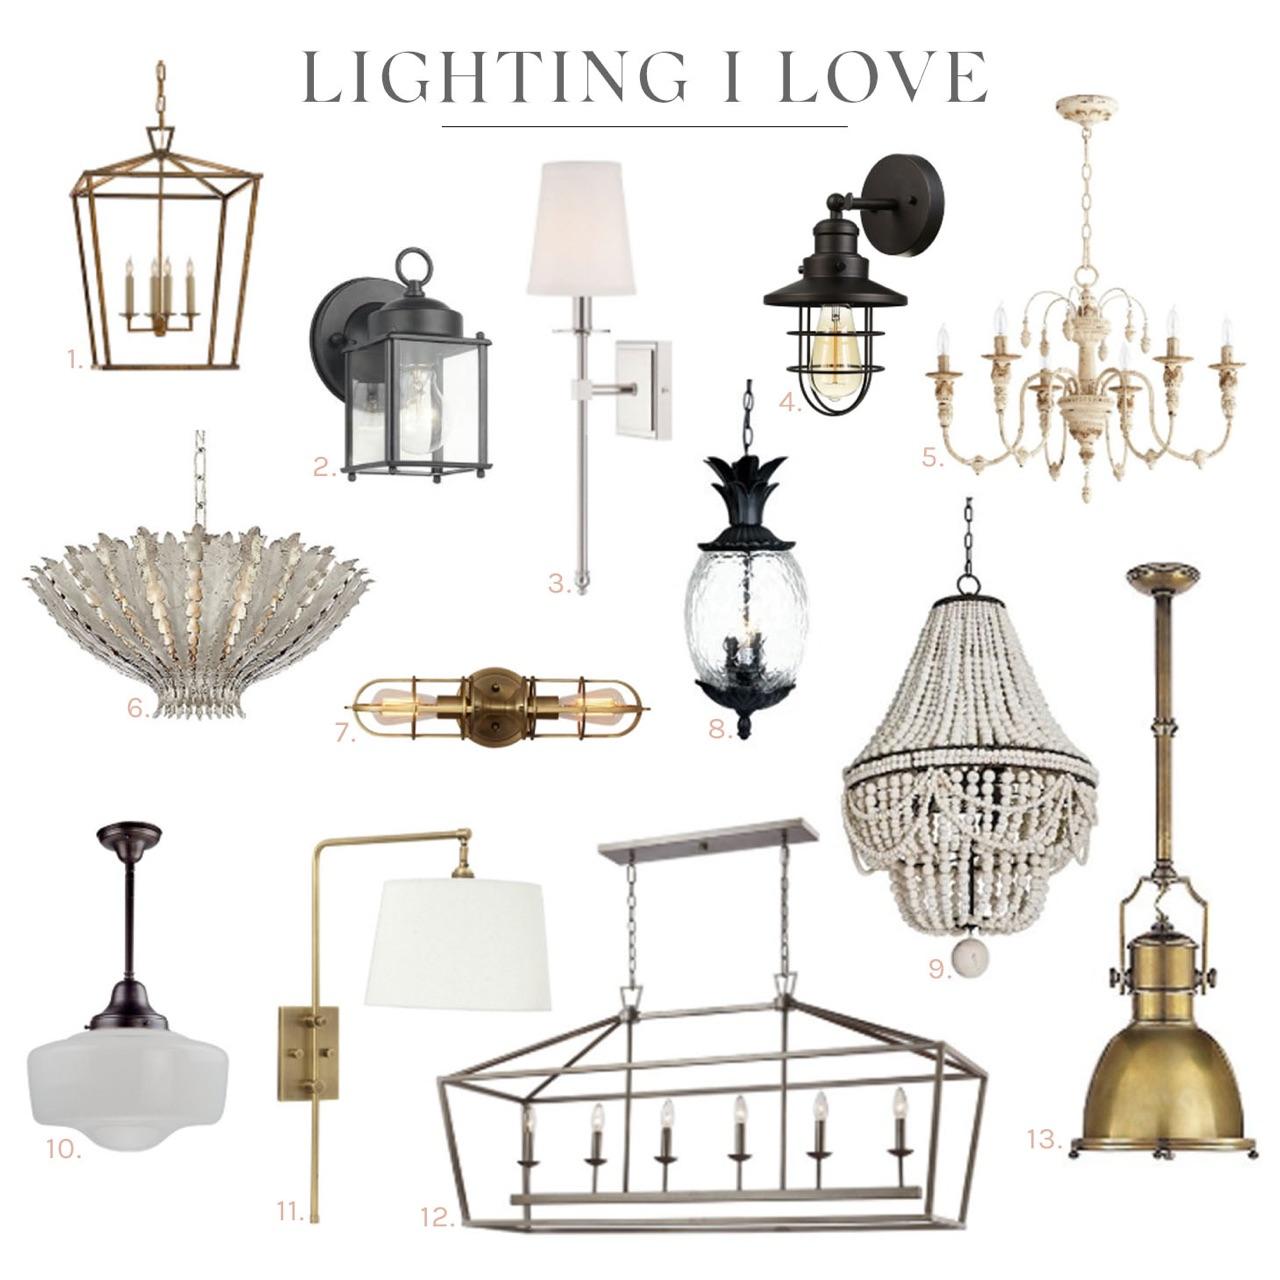 In My Home: Lighting I Love Regarding Paladino 6 Light Chandeliers (View 9 of 30)